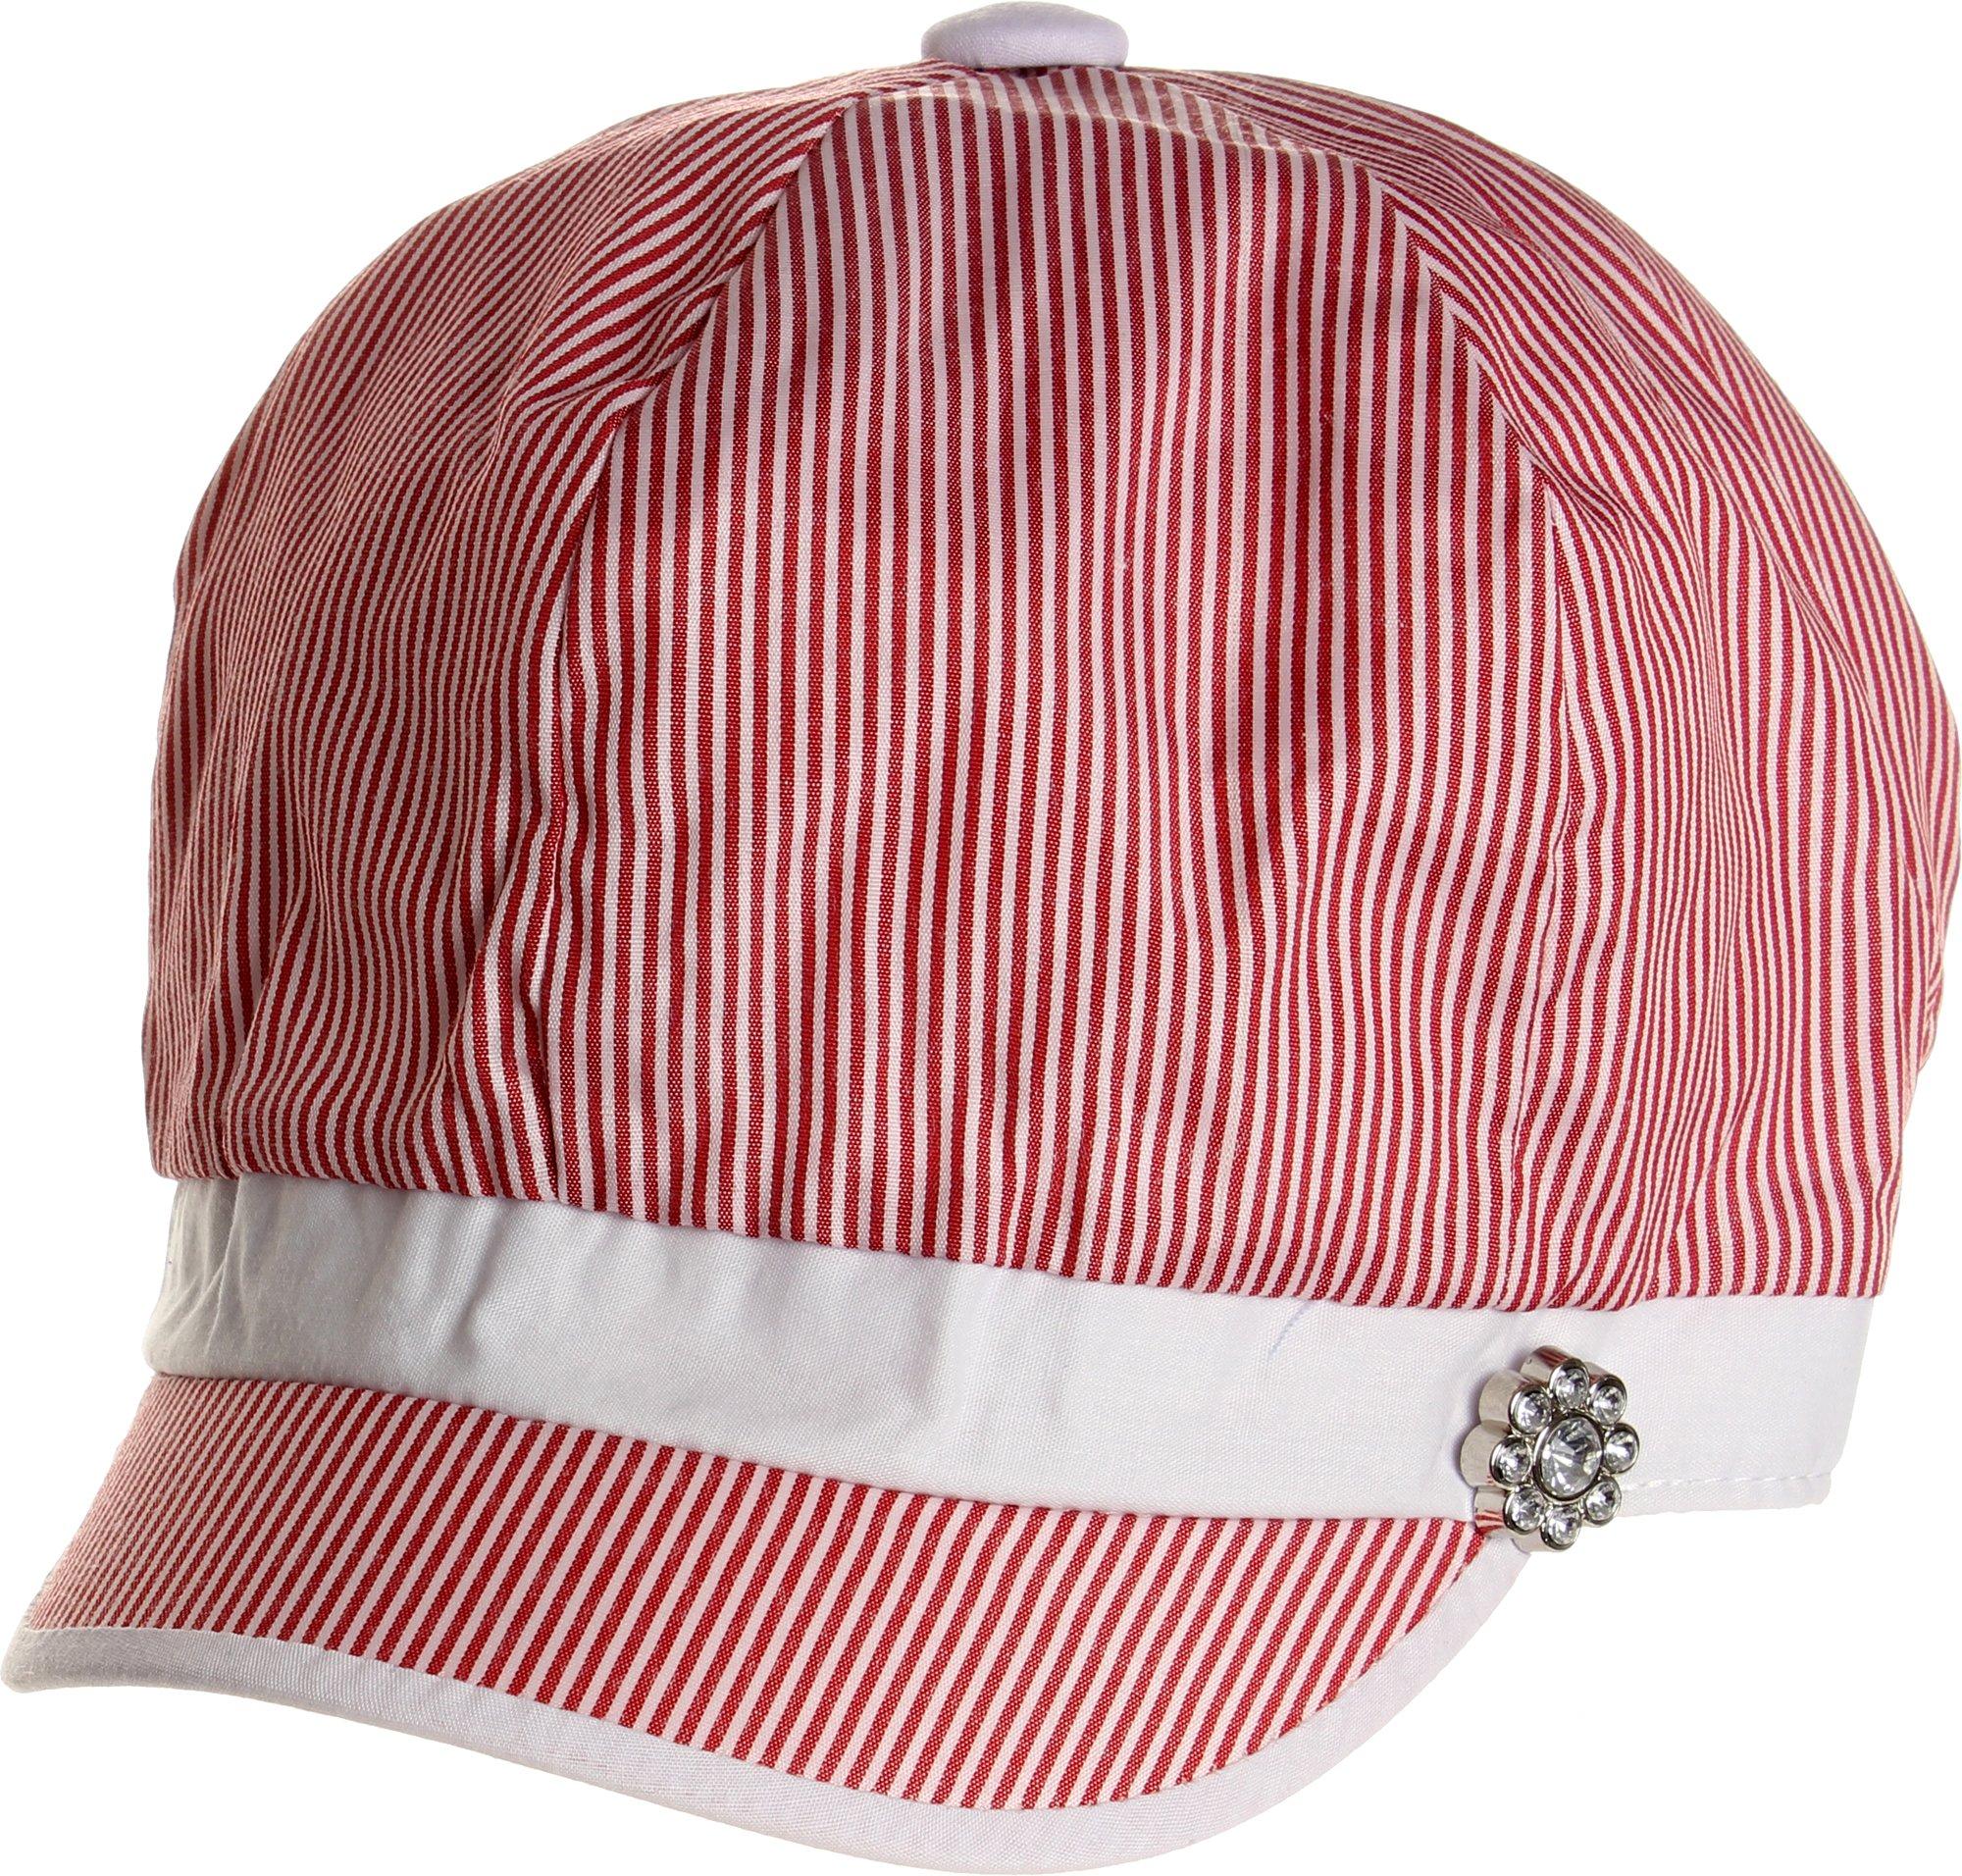 LL Women's Spring Summer Narrow Stripes Rhinestone Flower Cabbie Hats - Red